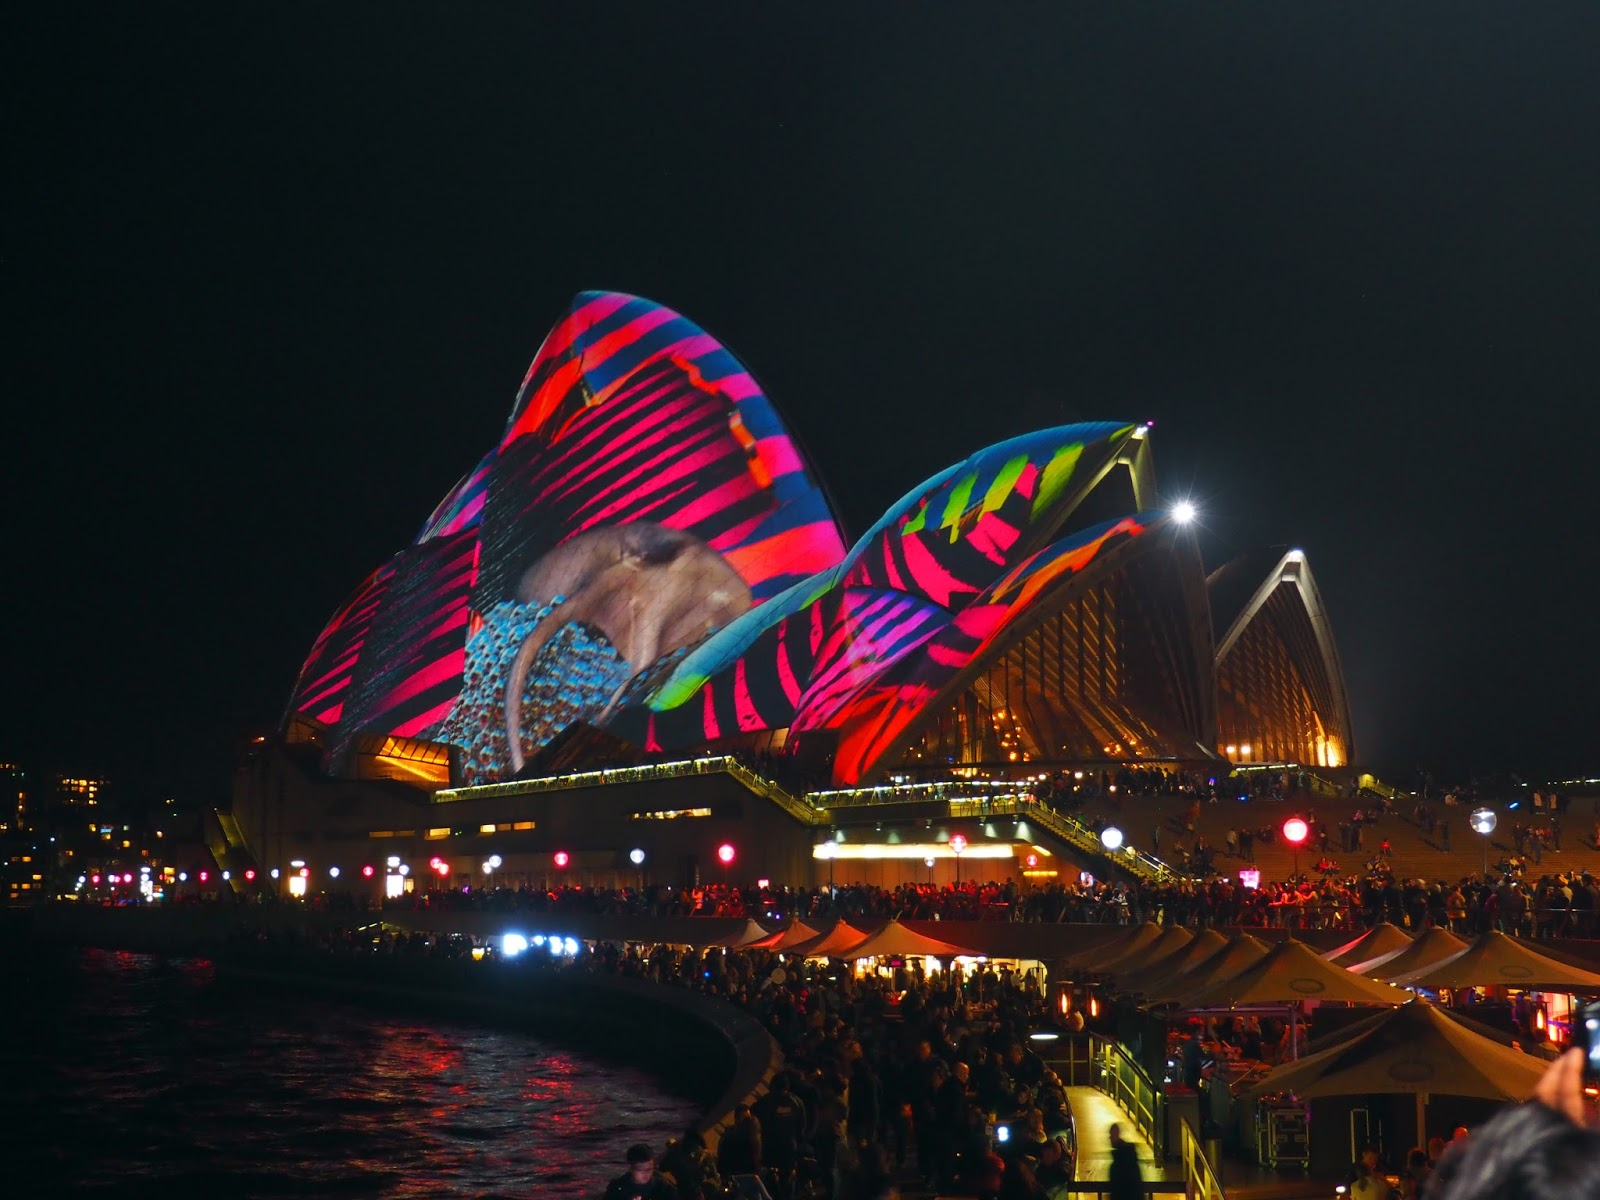 Vivid Sydney Opera House Sails